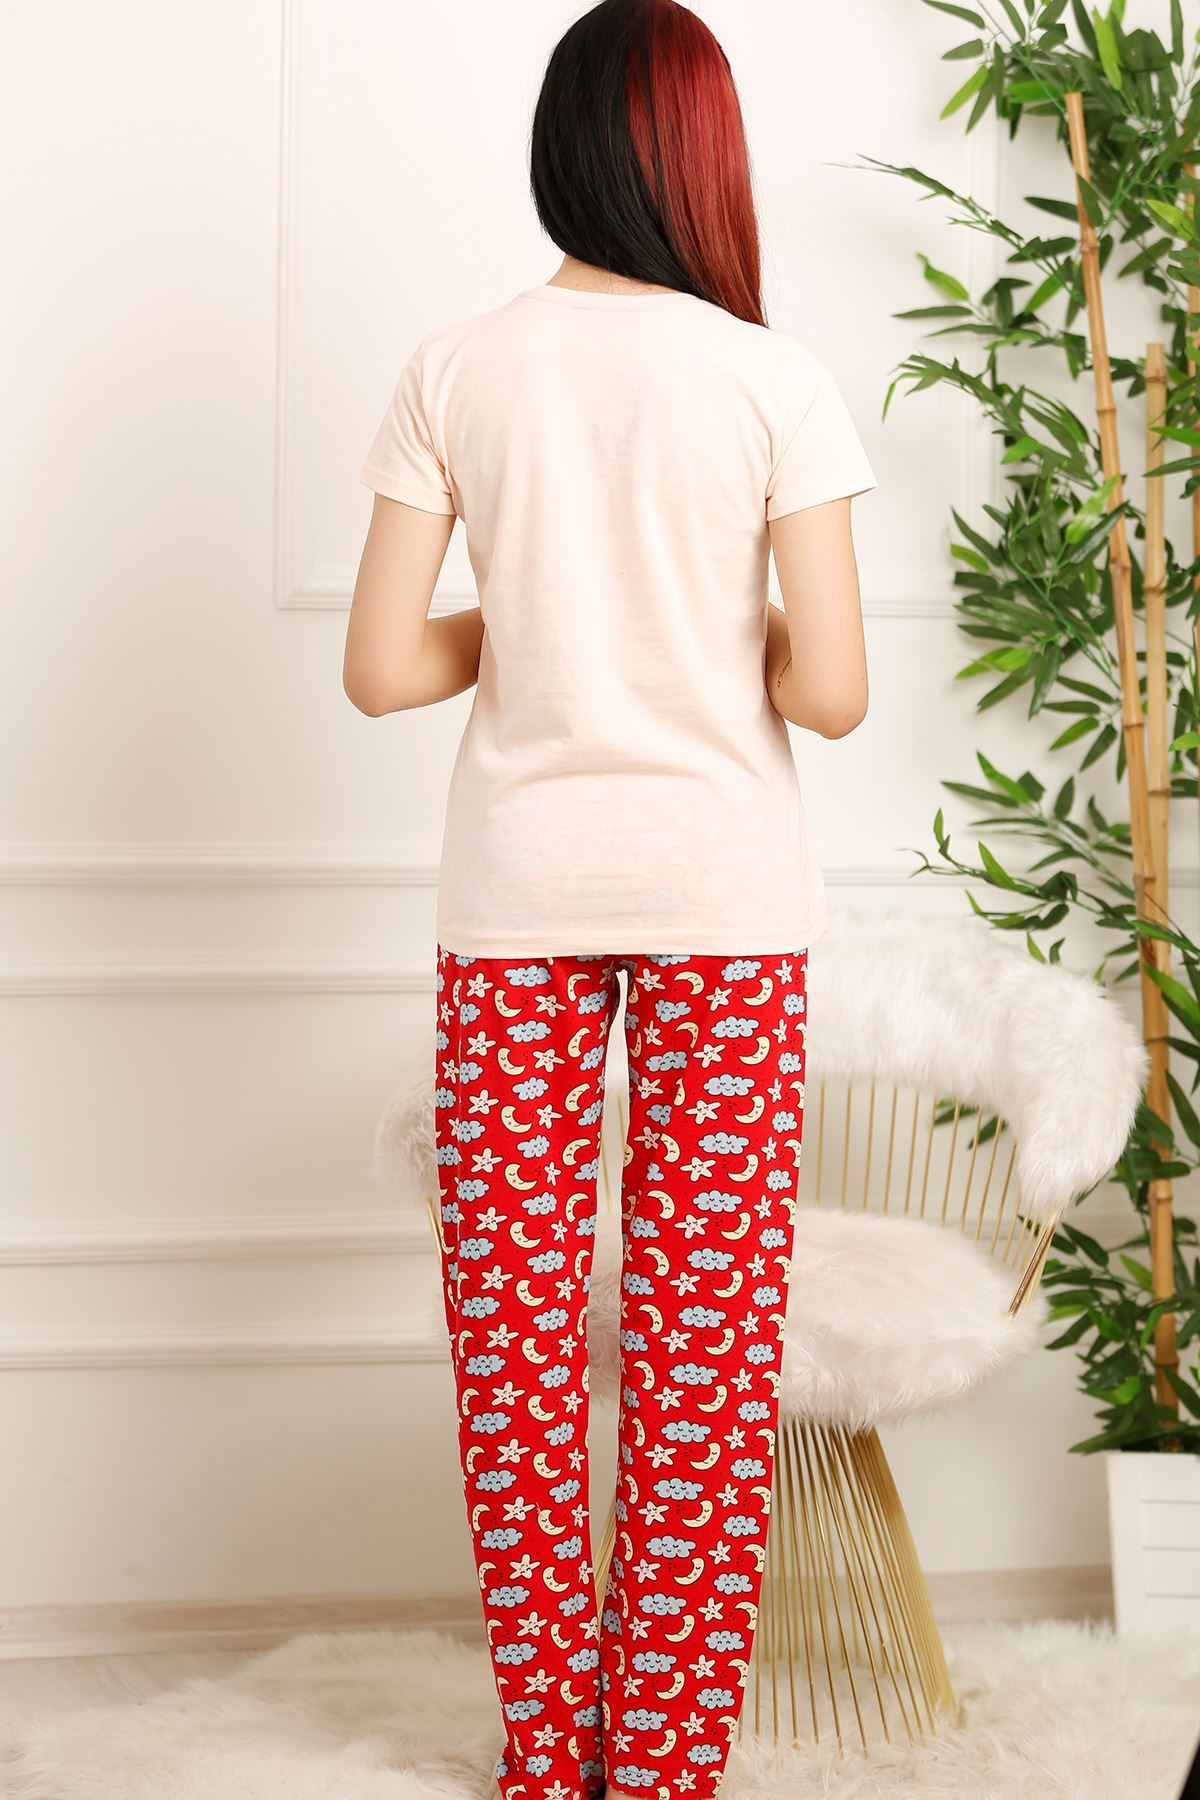 Kadın Pijama Takımı Pudra - 2459.1059.